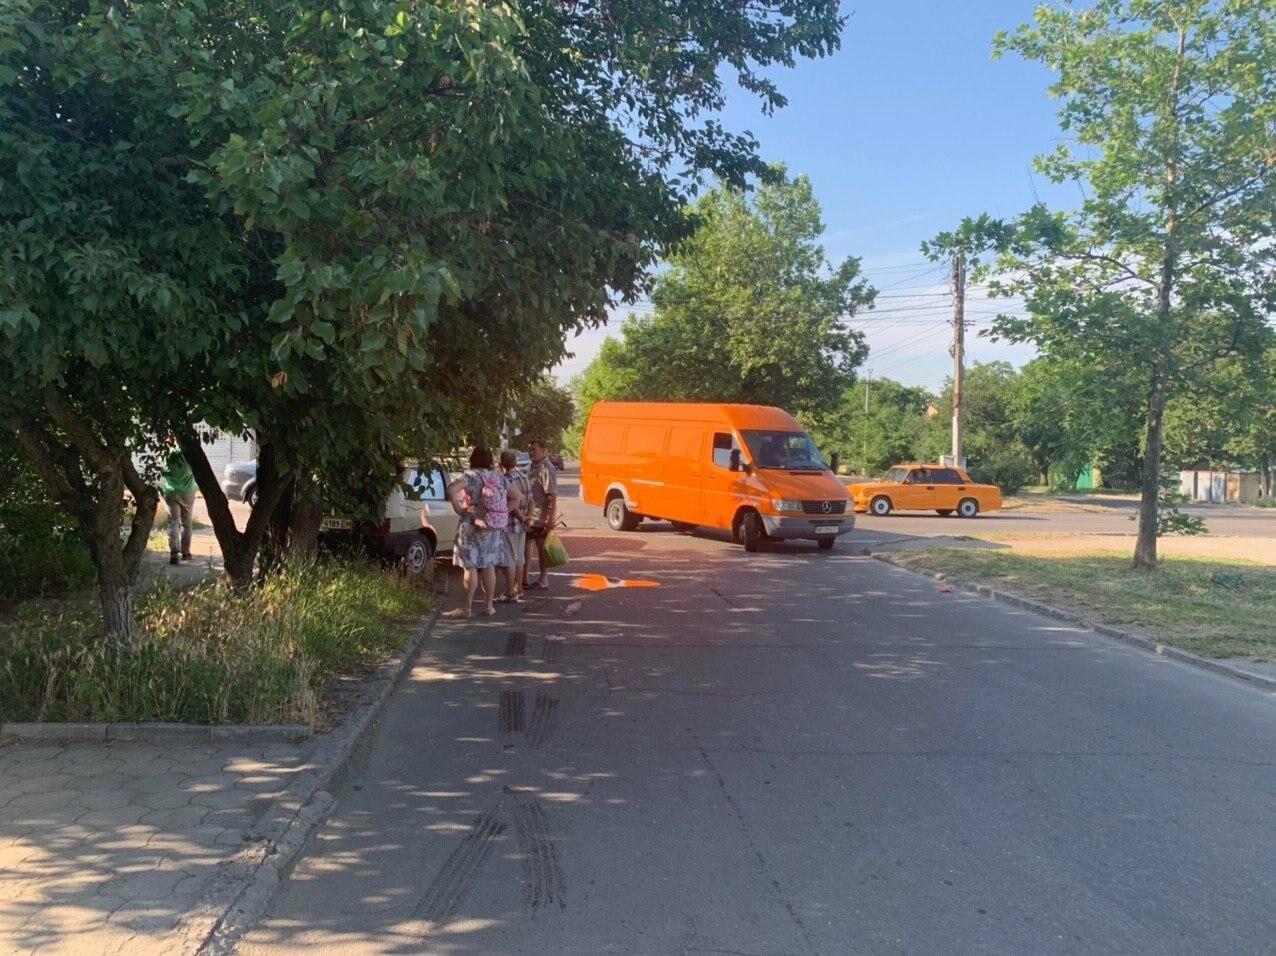 В Бердянске лбами столкнулися две машины, - ФОТО, фото-3